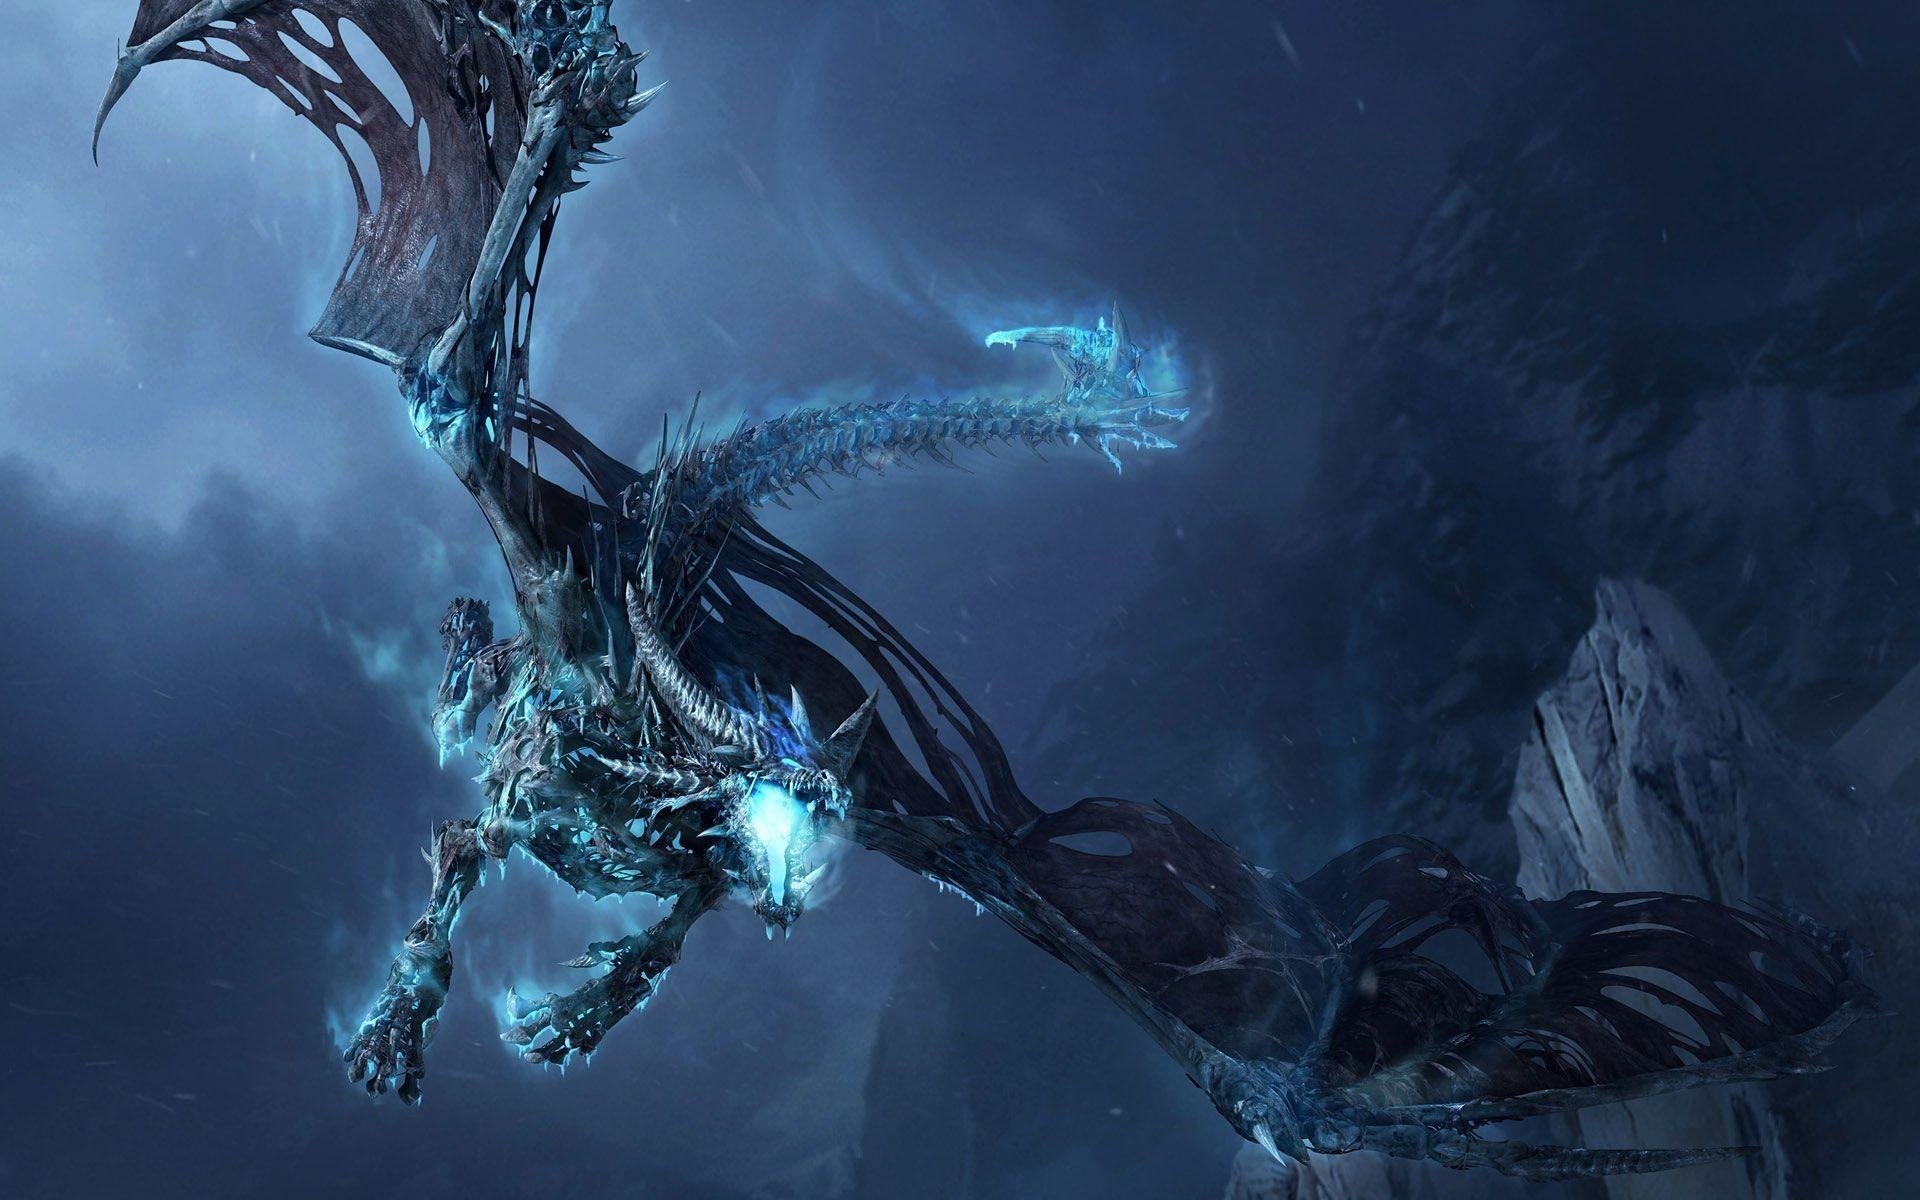 Dragon Images. Beautiful Dragon Wallpapers HQFX